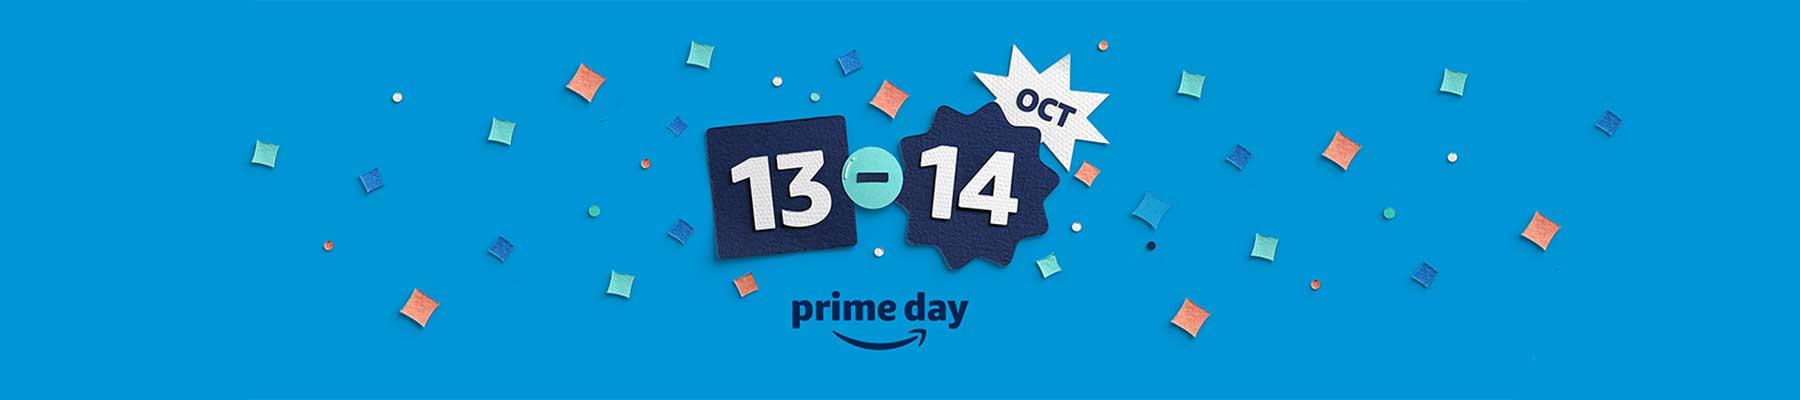 Amazon Prime Day imagen promocional